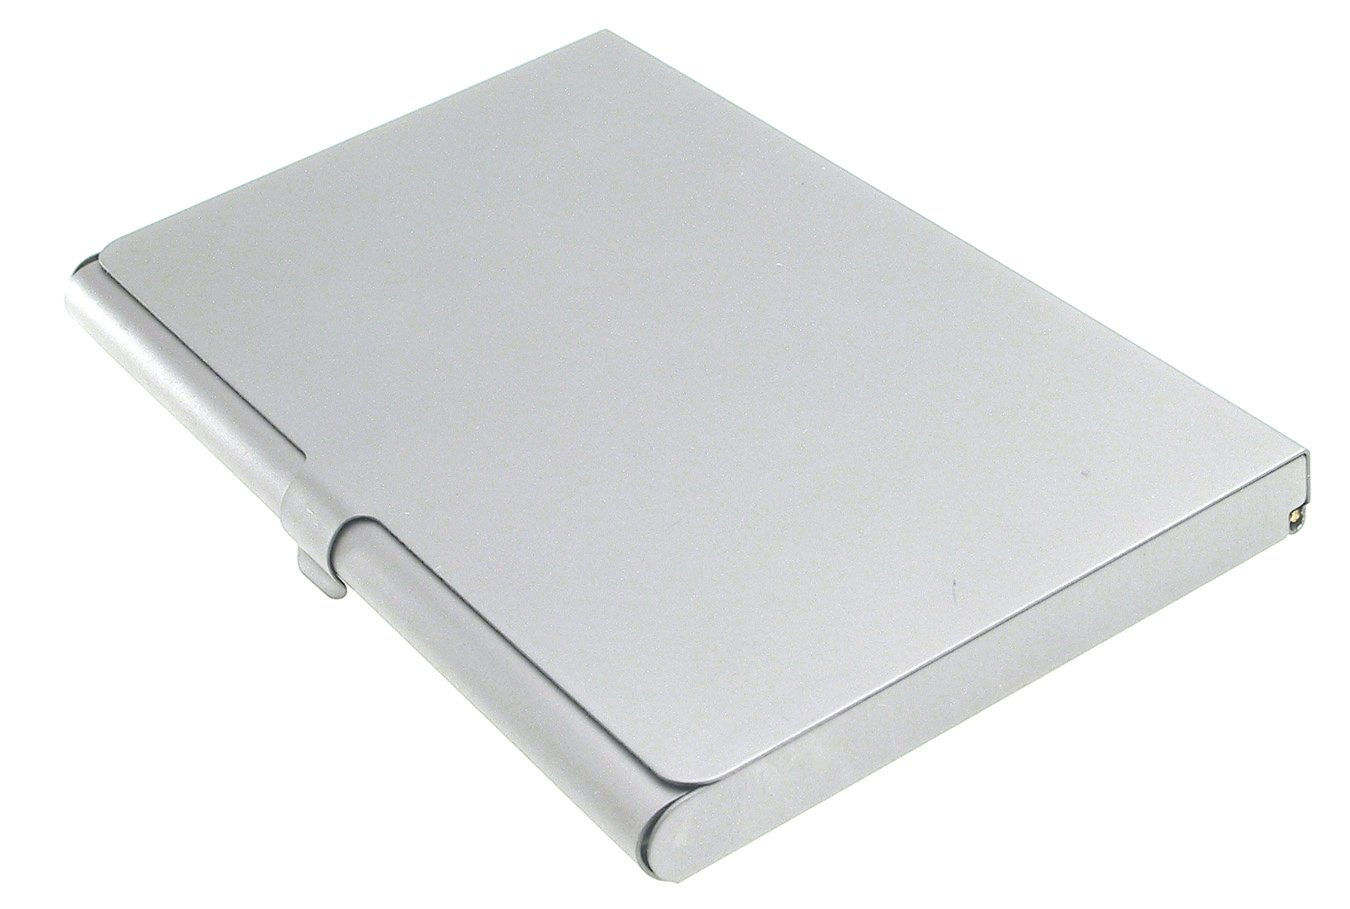 Business Name Case Card Holder Aluminum Assorted Colors by Kikkerland (Image #1)